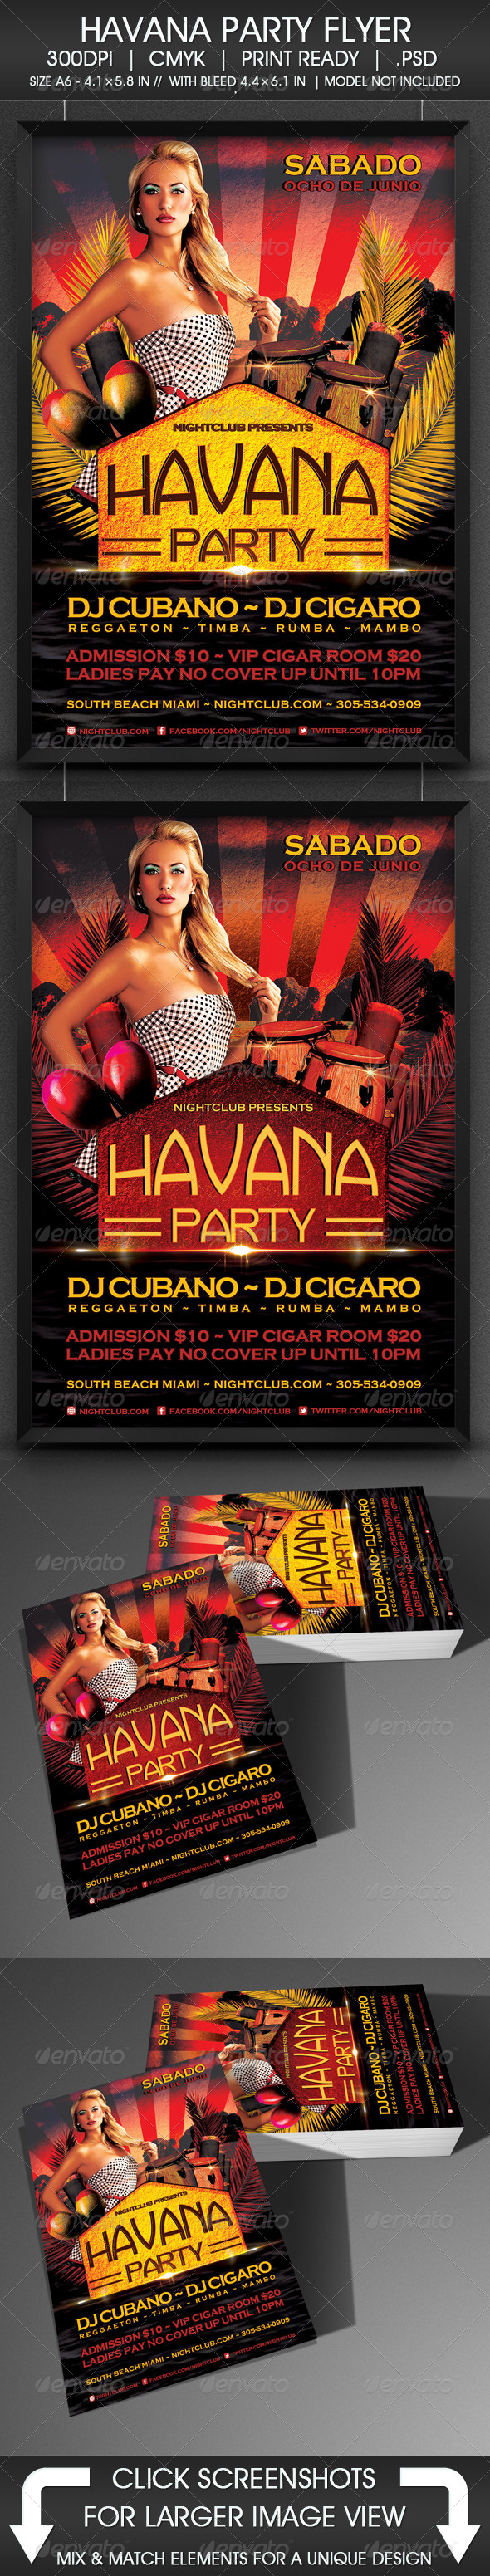 Havana Party - Events Flyers